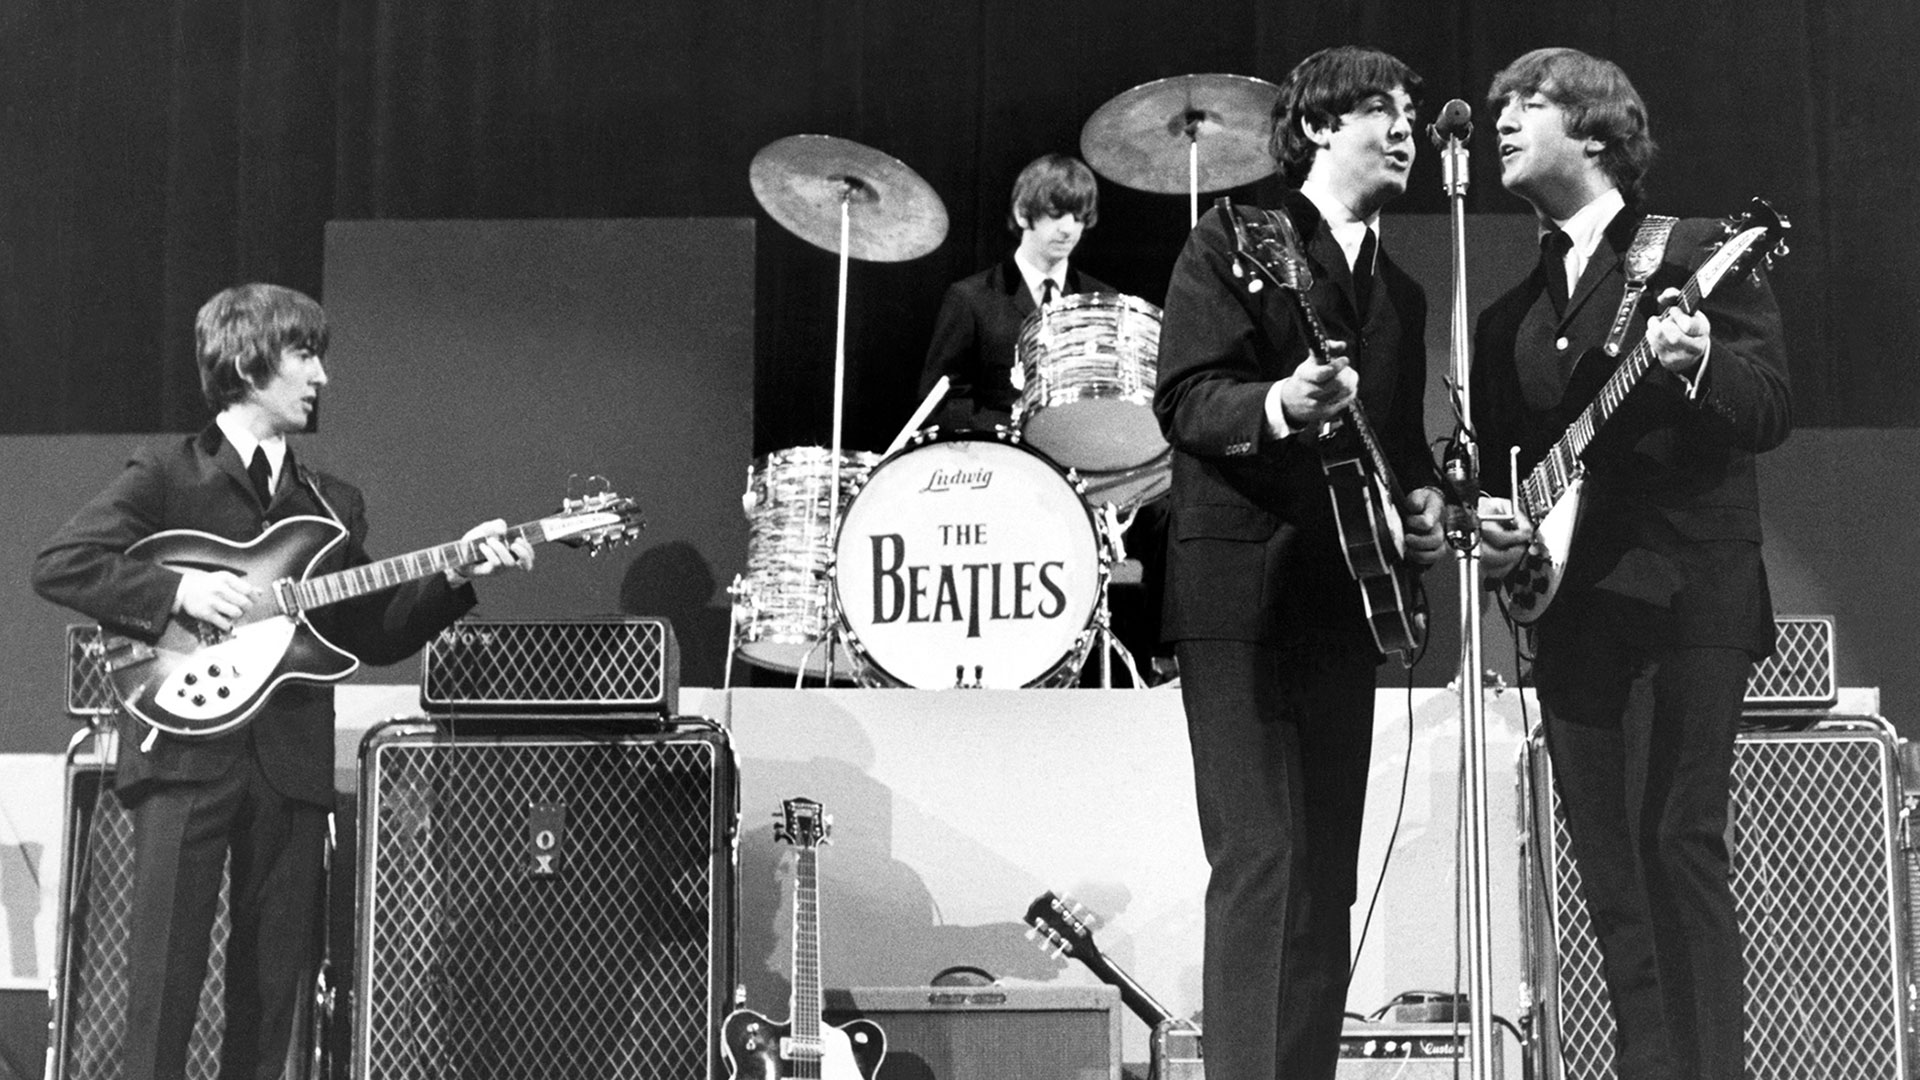 The Beatles In Montr 233 Al Pointe 224 Calli 232 Re Montr 233 Al